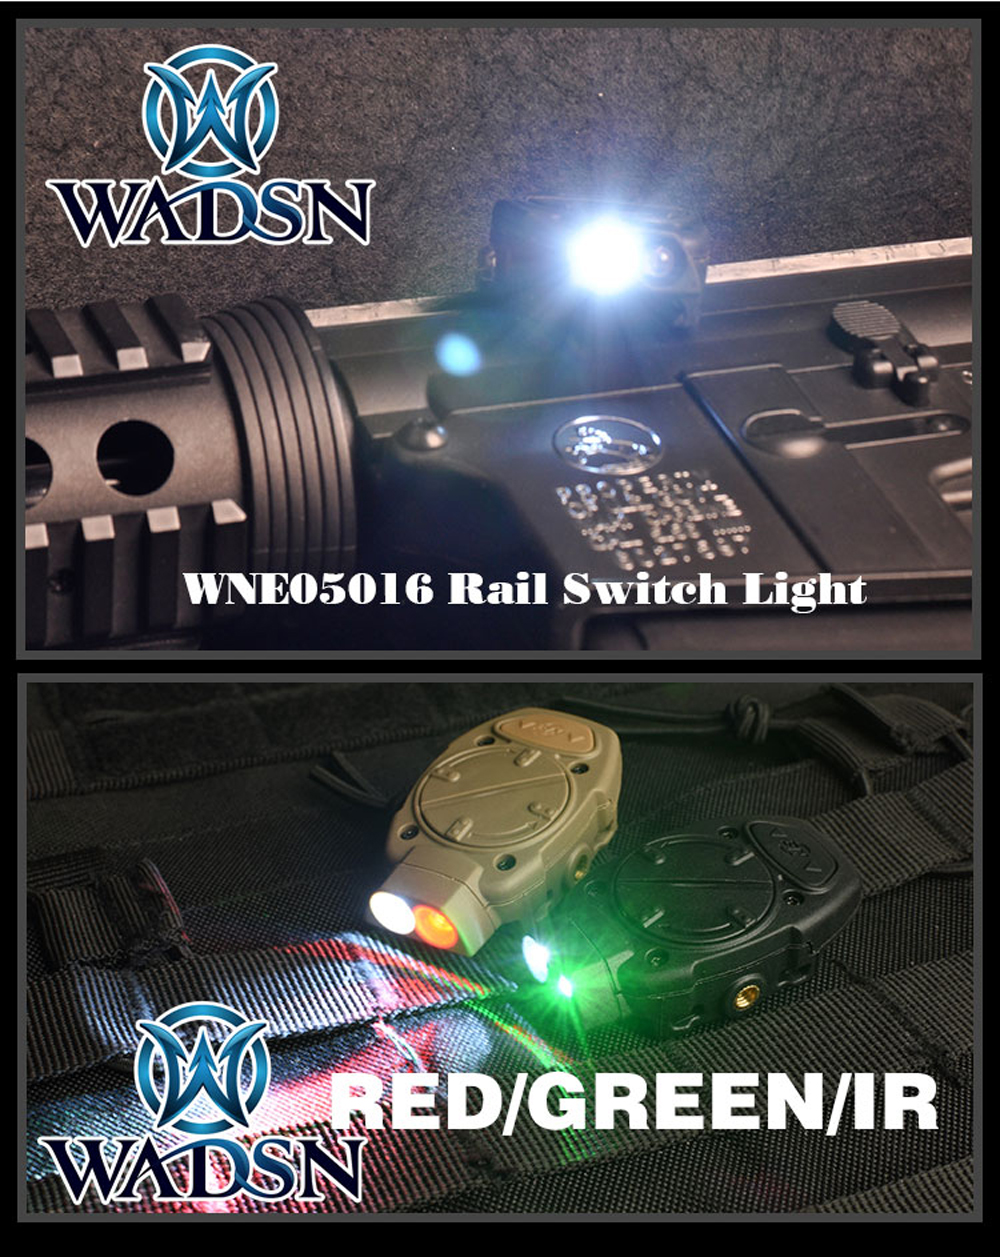 vermelho ir softair arma luz wne05016